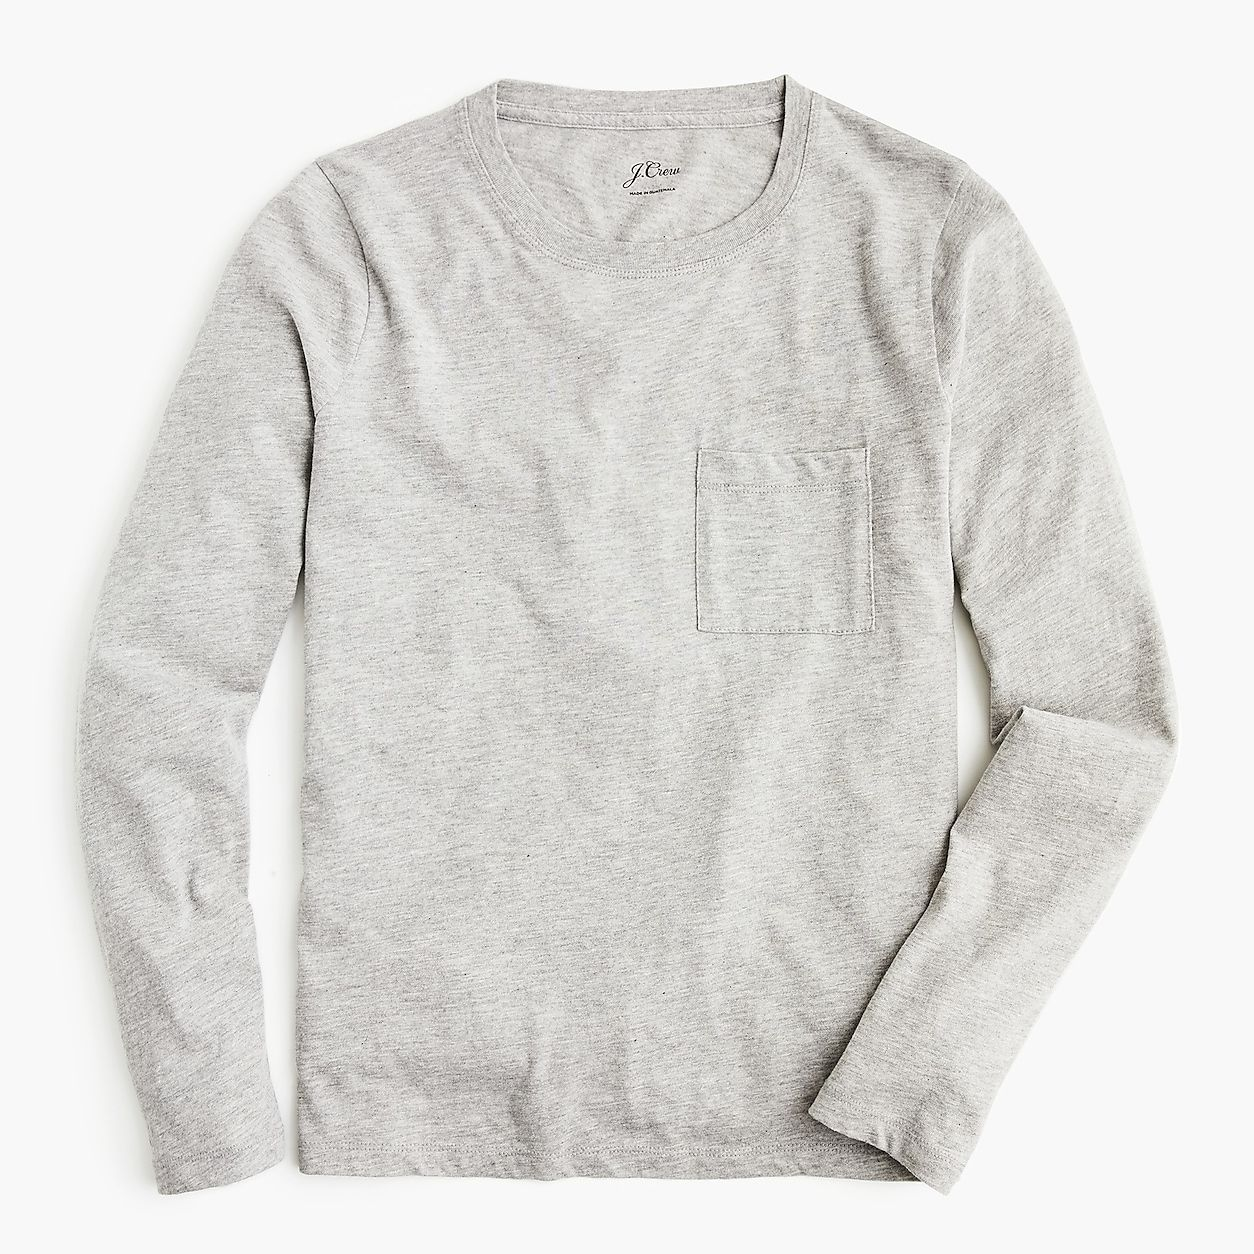 9b30a6a286 J. Crew Essential Long-Sleeve Pocket T-Shirt